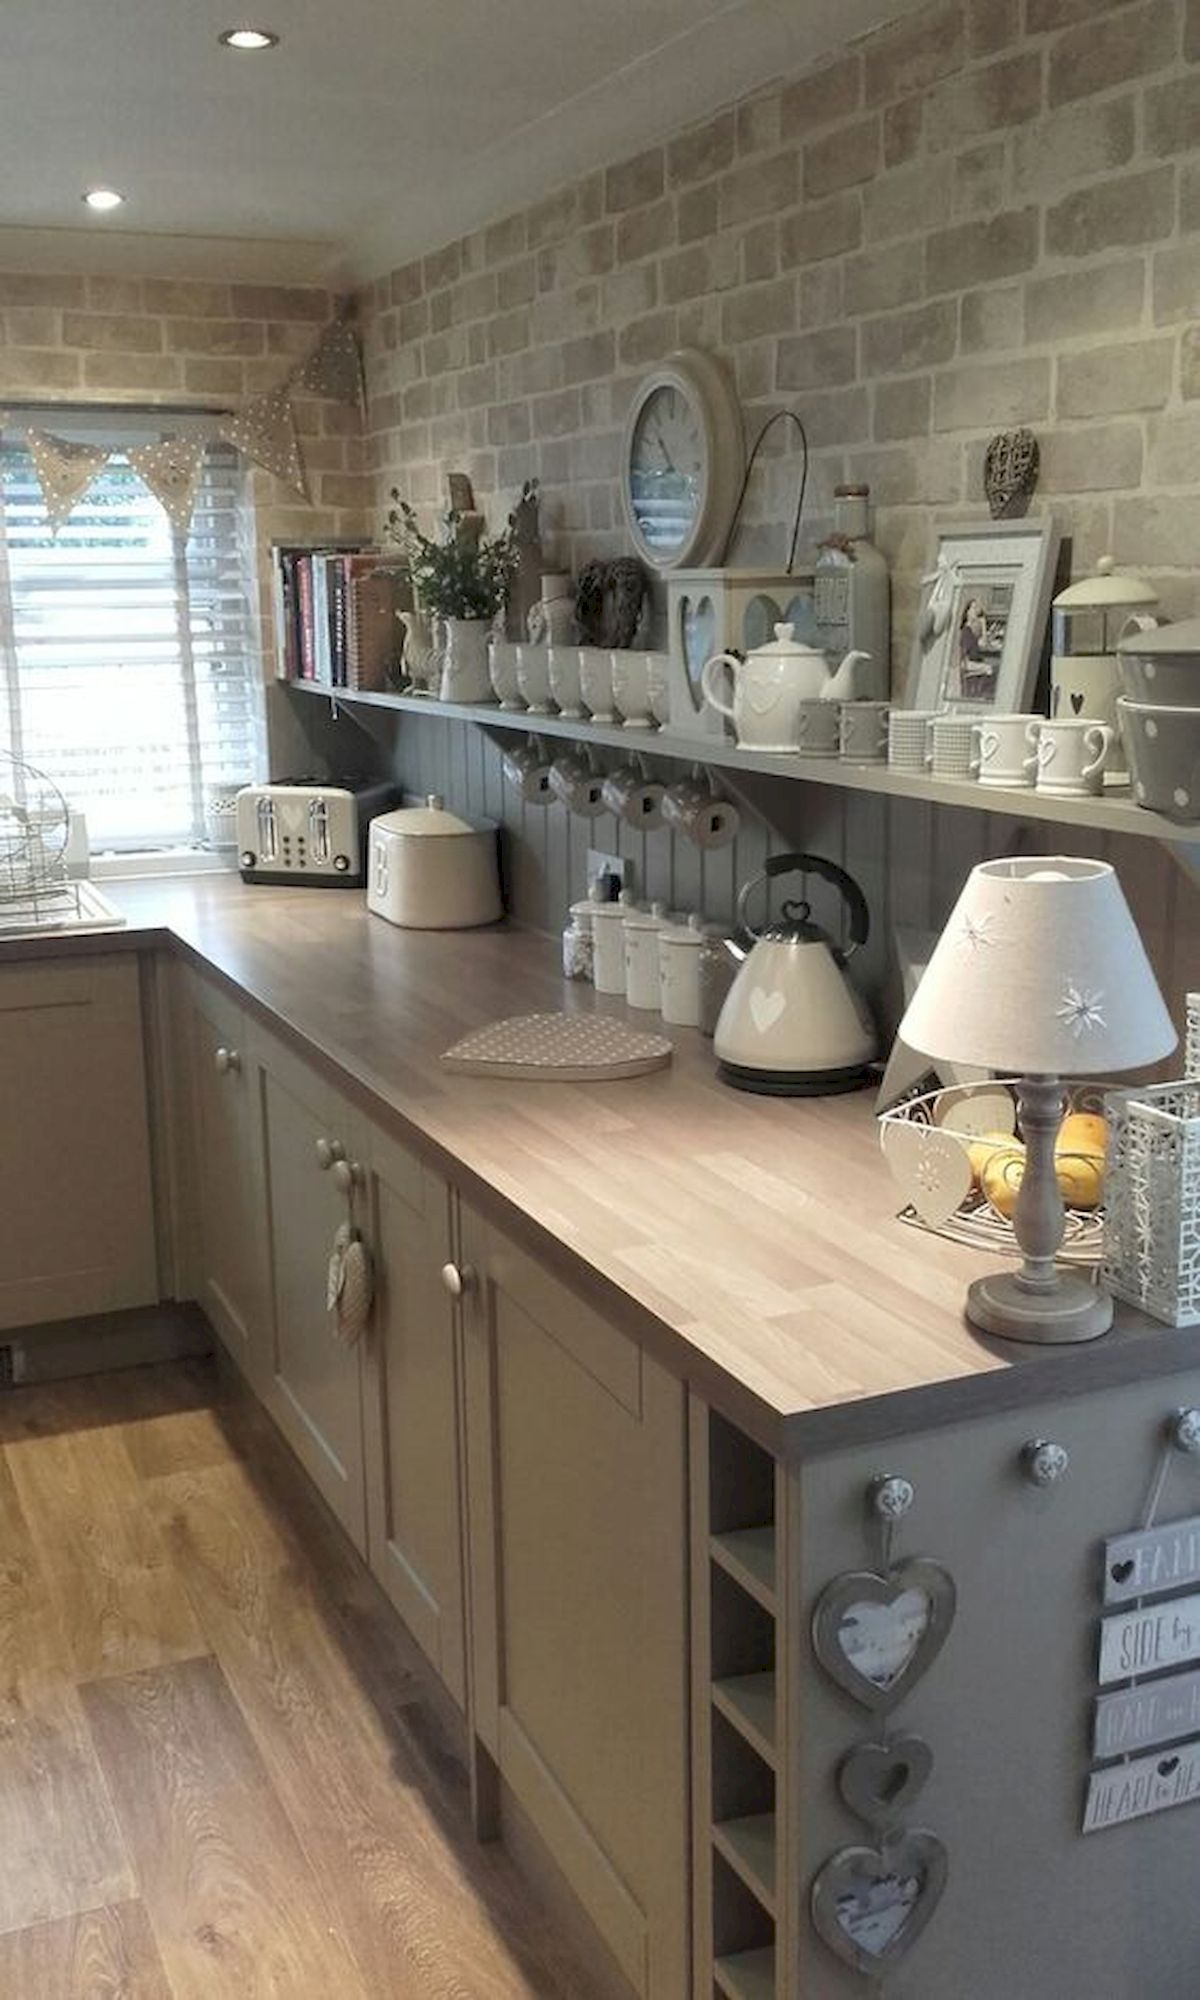 Pin By Sara Romano On Otthon Kitchen Design Countertops Farmhouse Kitchen Countertops Kitchen Remodel Small